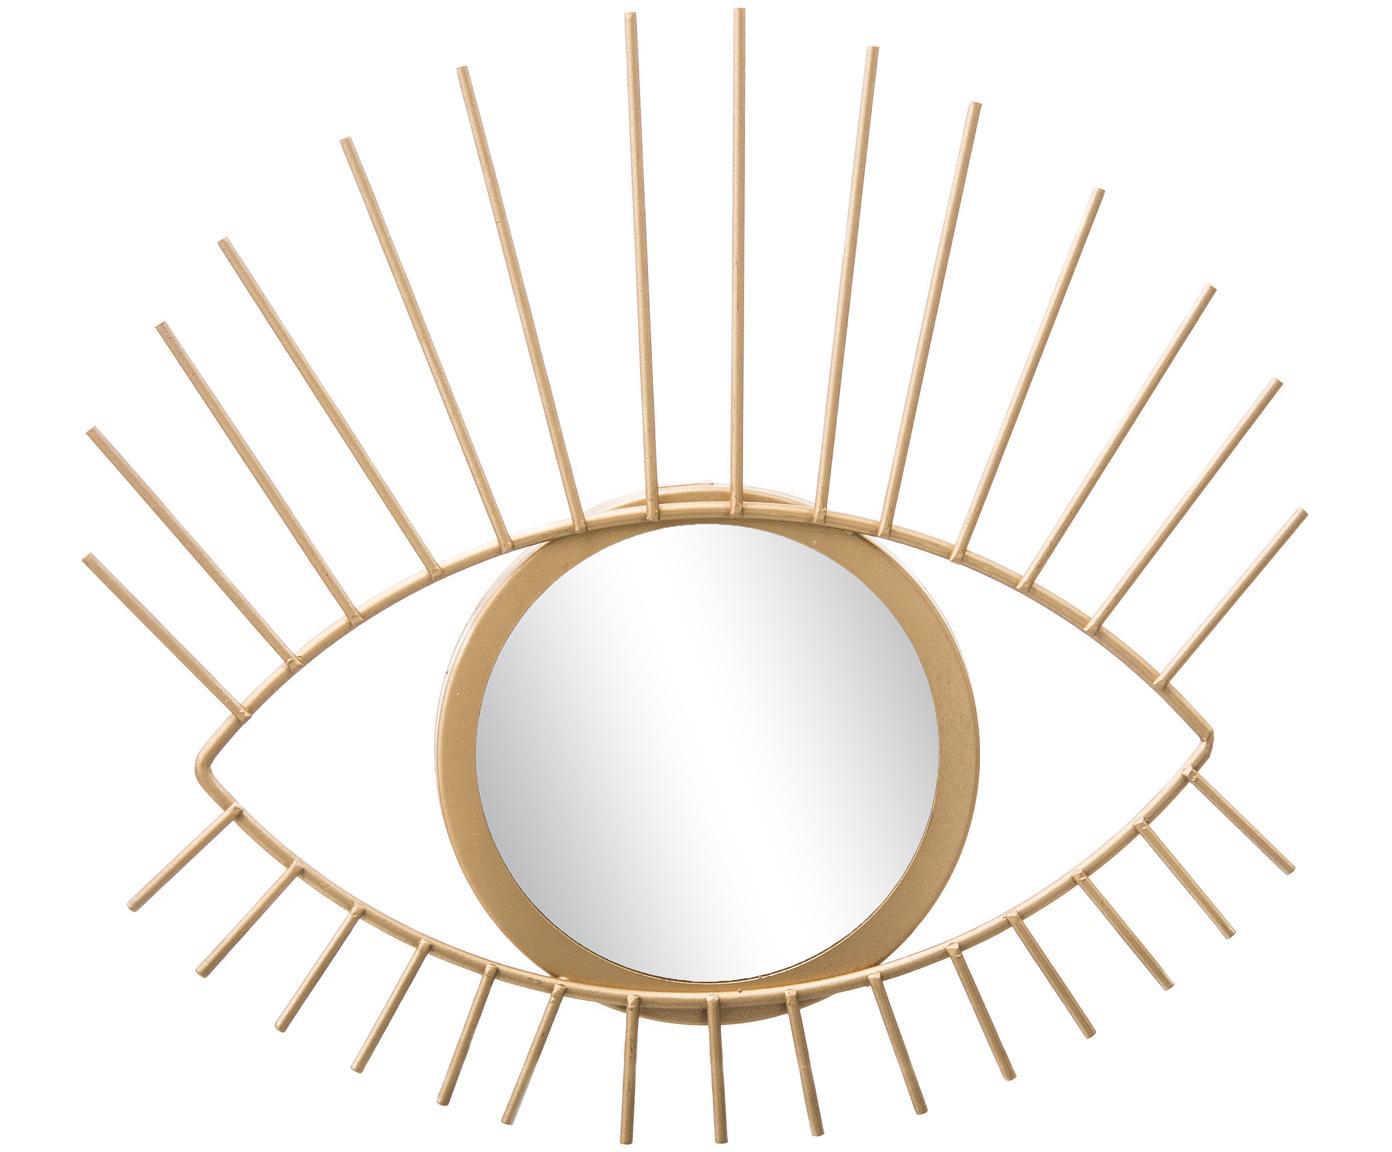 Espejo de pared Auge, Espejo: cristal, Marco: dorado Espejo: cristal, An 27 x Al 31 cm